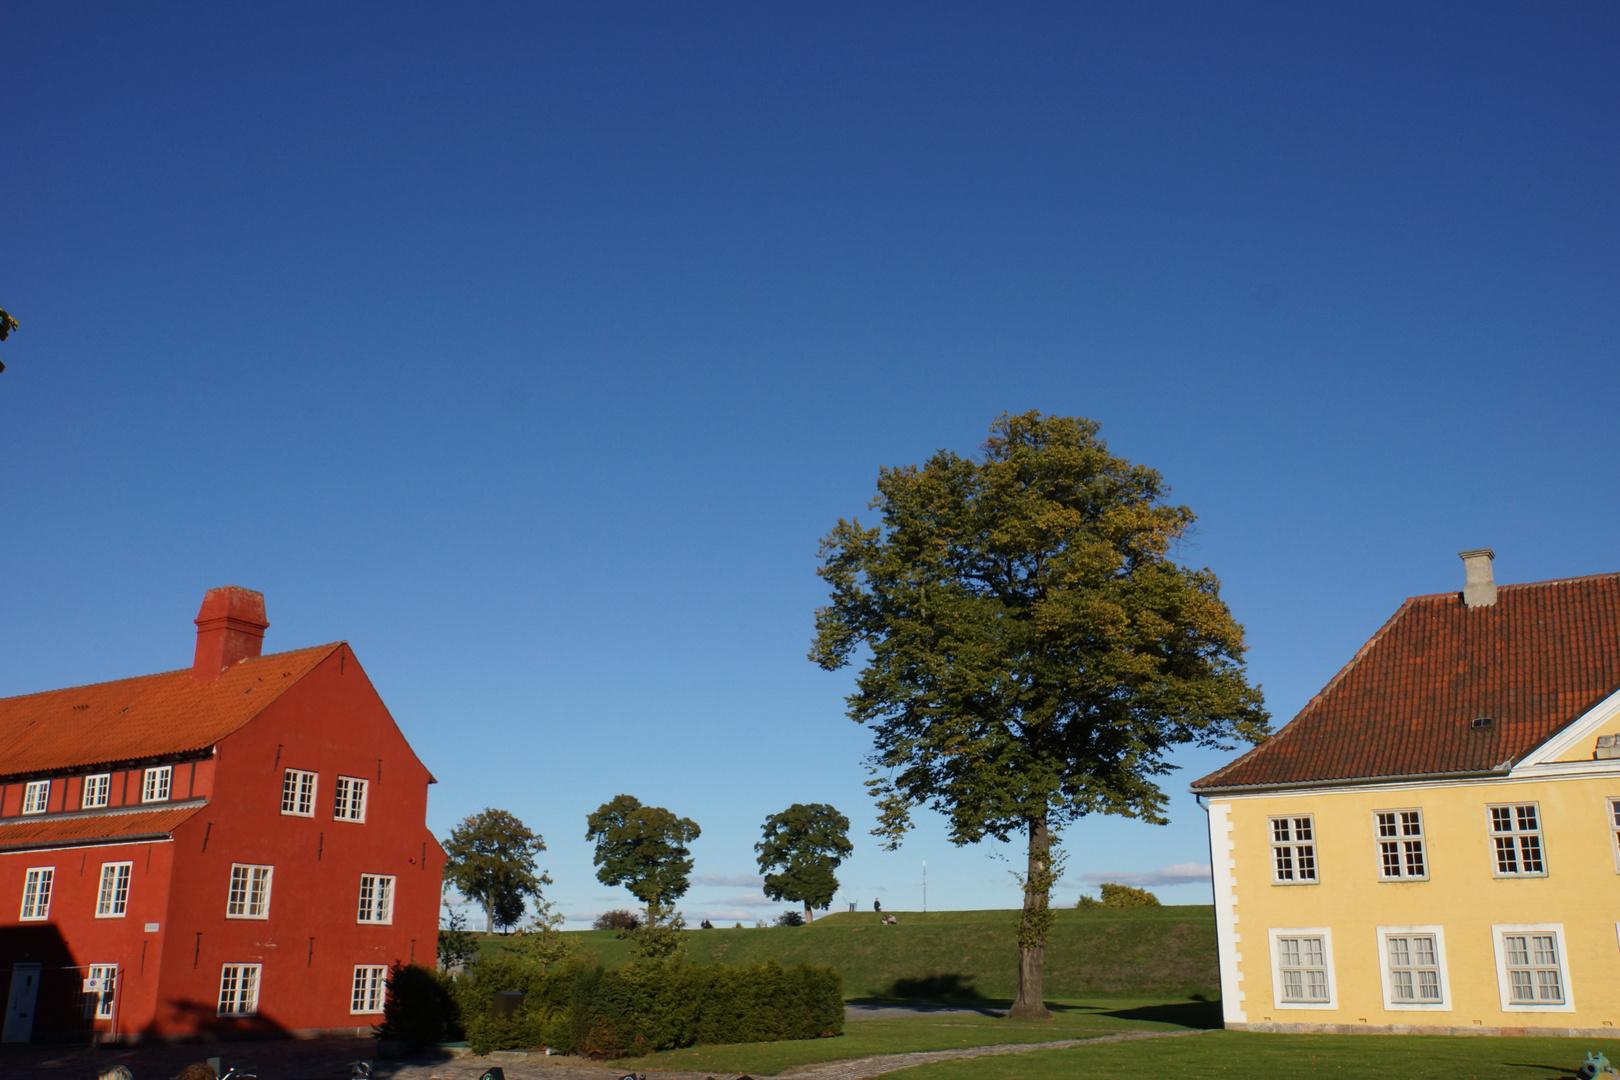 Kopenhagen Kastellet